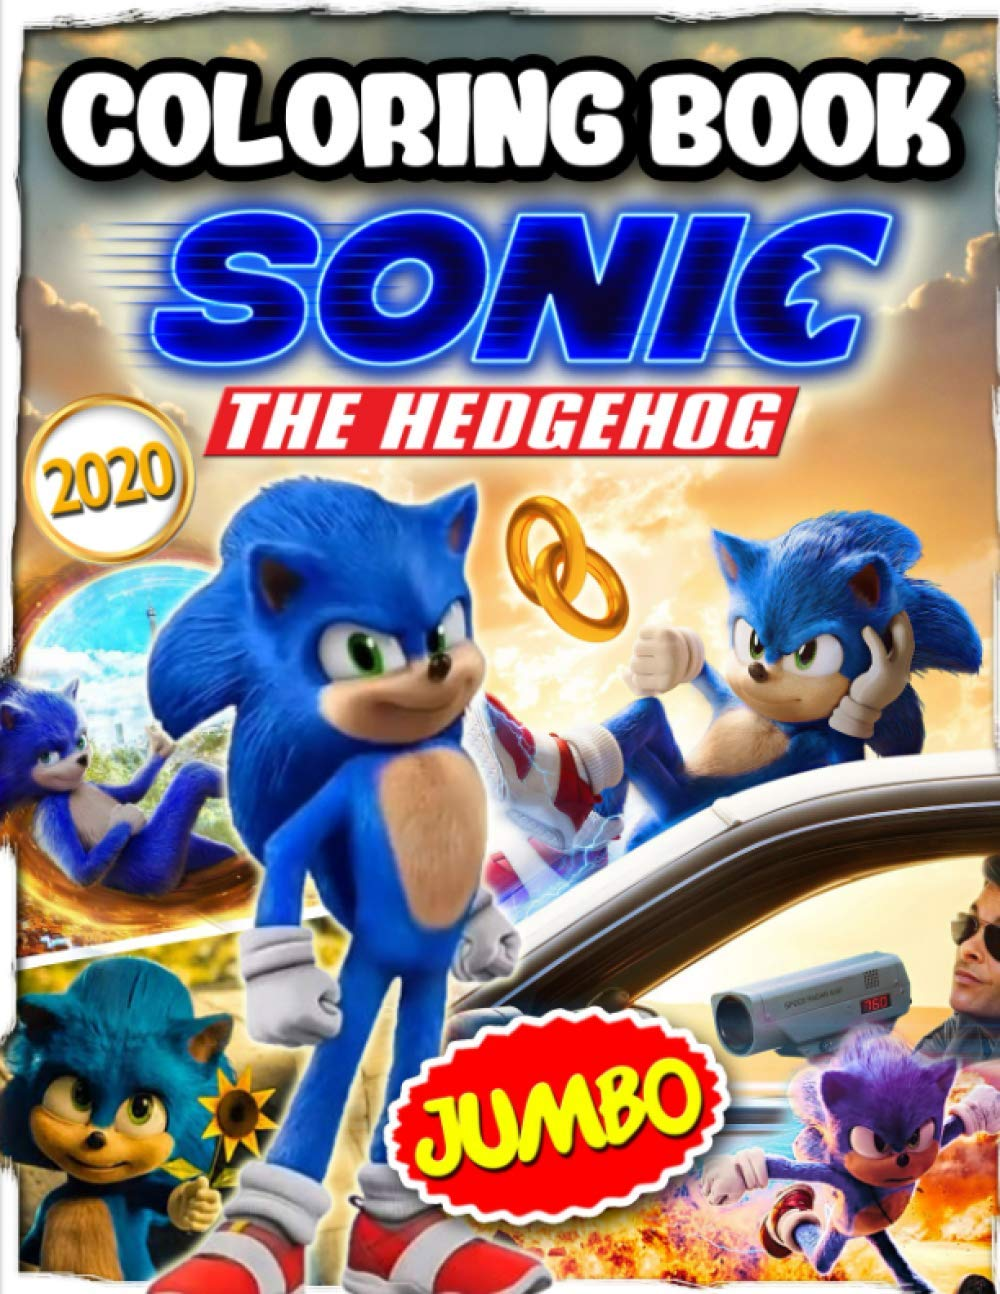 Sonic The Hedgehog 2020 Coloring Book Sonic 2020 Coloring Book Based On Sonic The Hedgehog 2020 Adventure Film Johnson Dave 9798624378537 Amazon Com Books